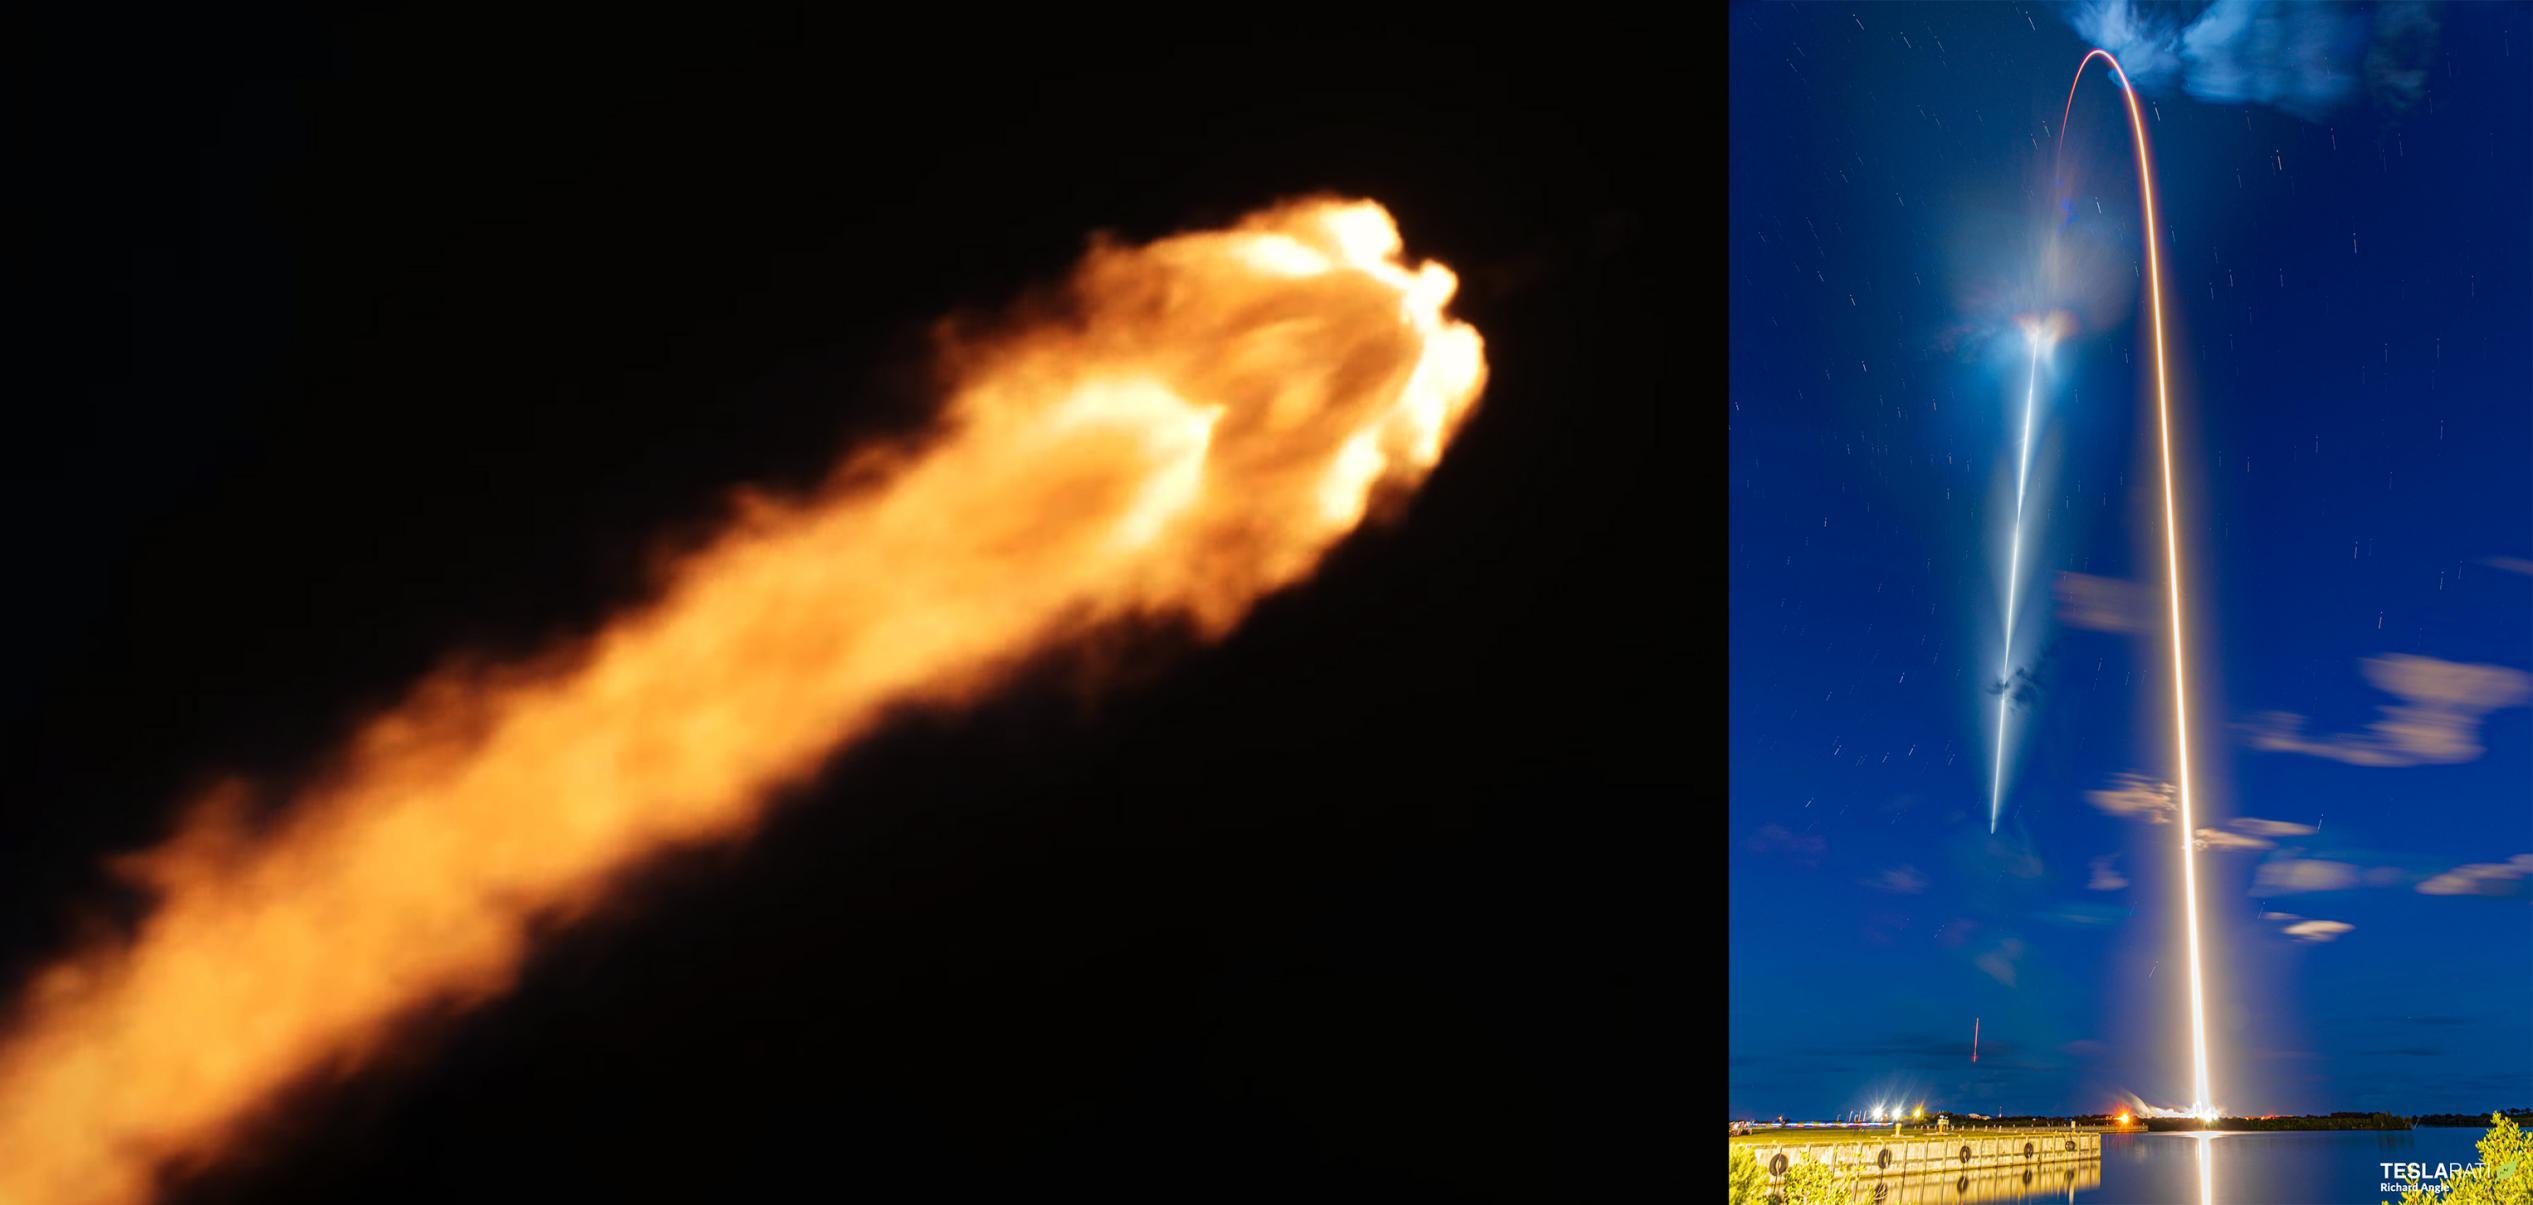 Inspiration4 Dragon C207 F9 B1062 091521 (SpaceX – Richard Angle) launch + streak 1 (c)